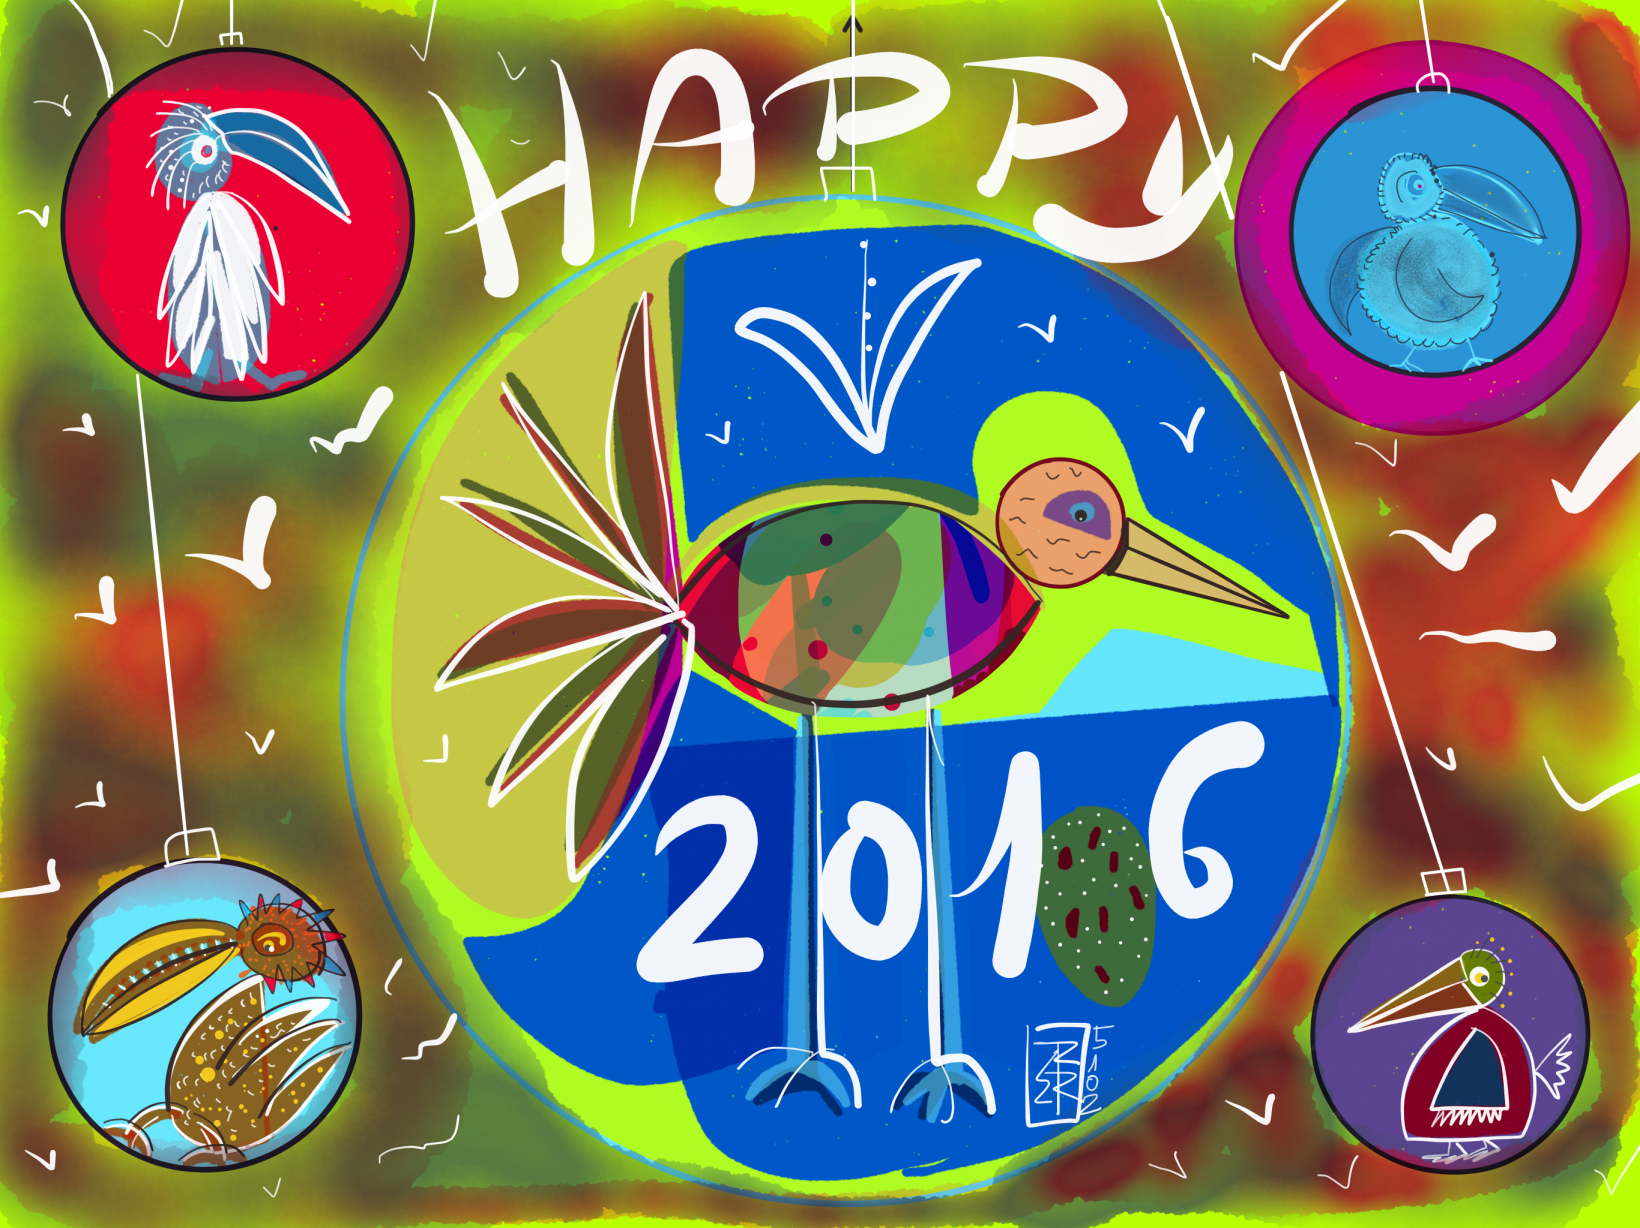 Happy 2016 (2015) - Ricardo Rocío Blanco